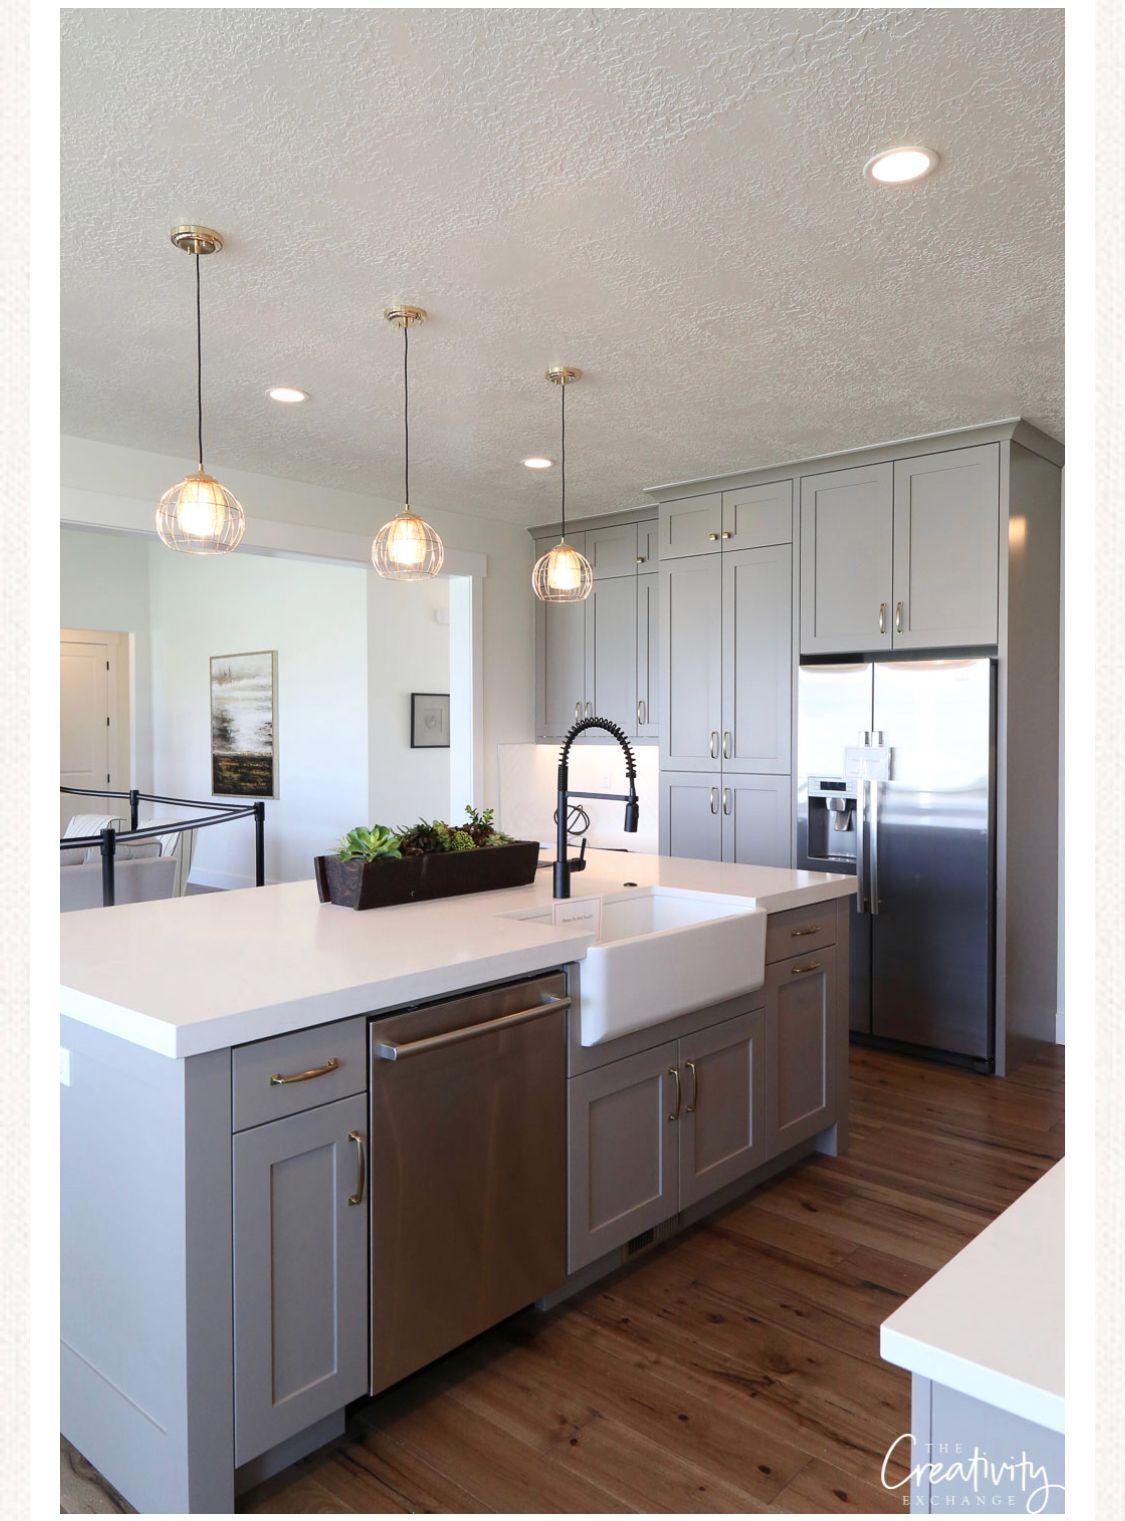 Cabinets BM Fieldstone | kitchen | Farmhouse kitchen ...